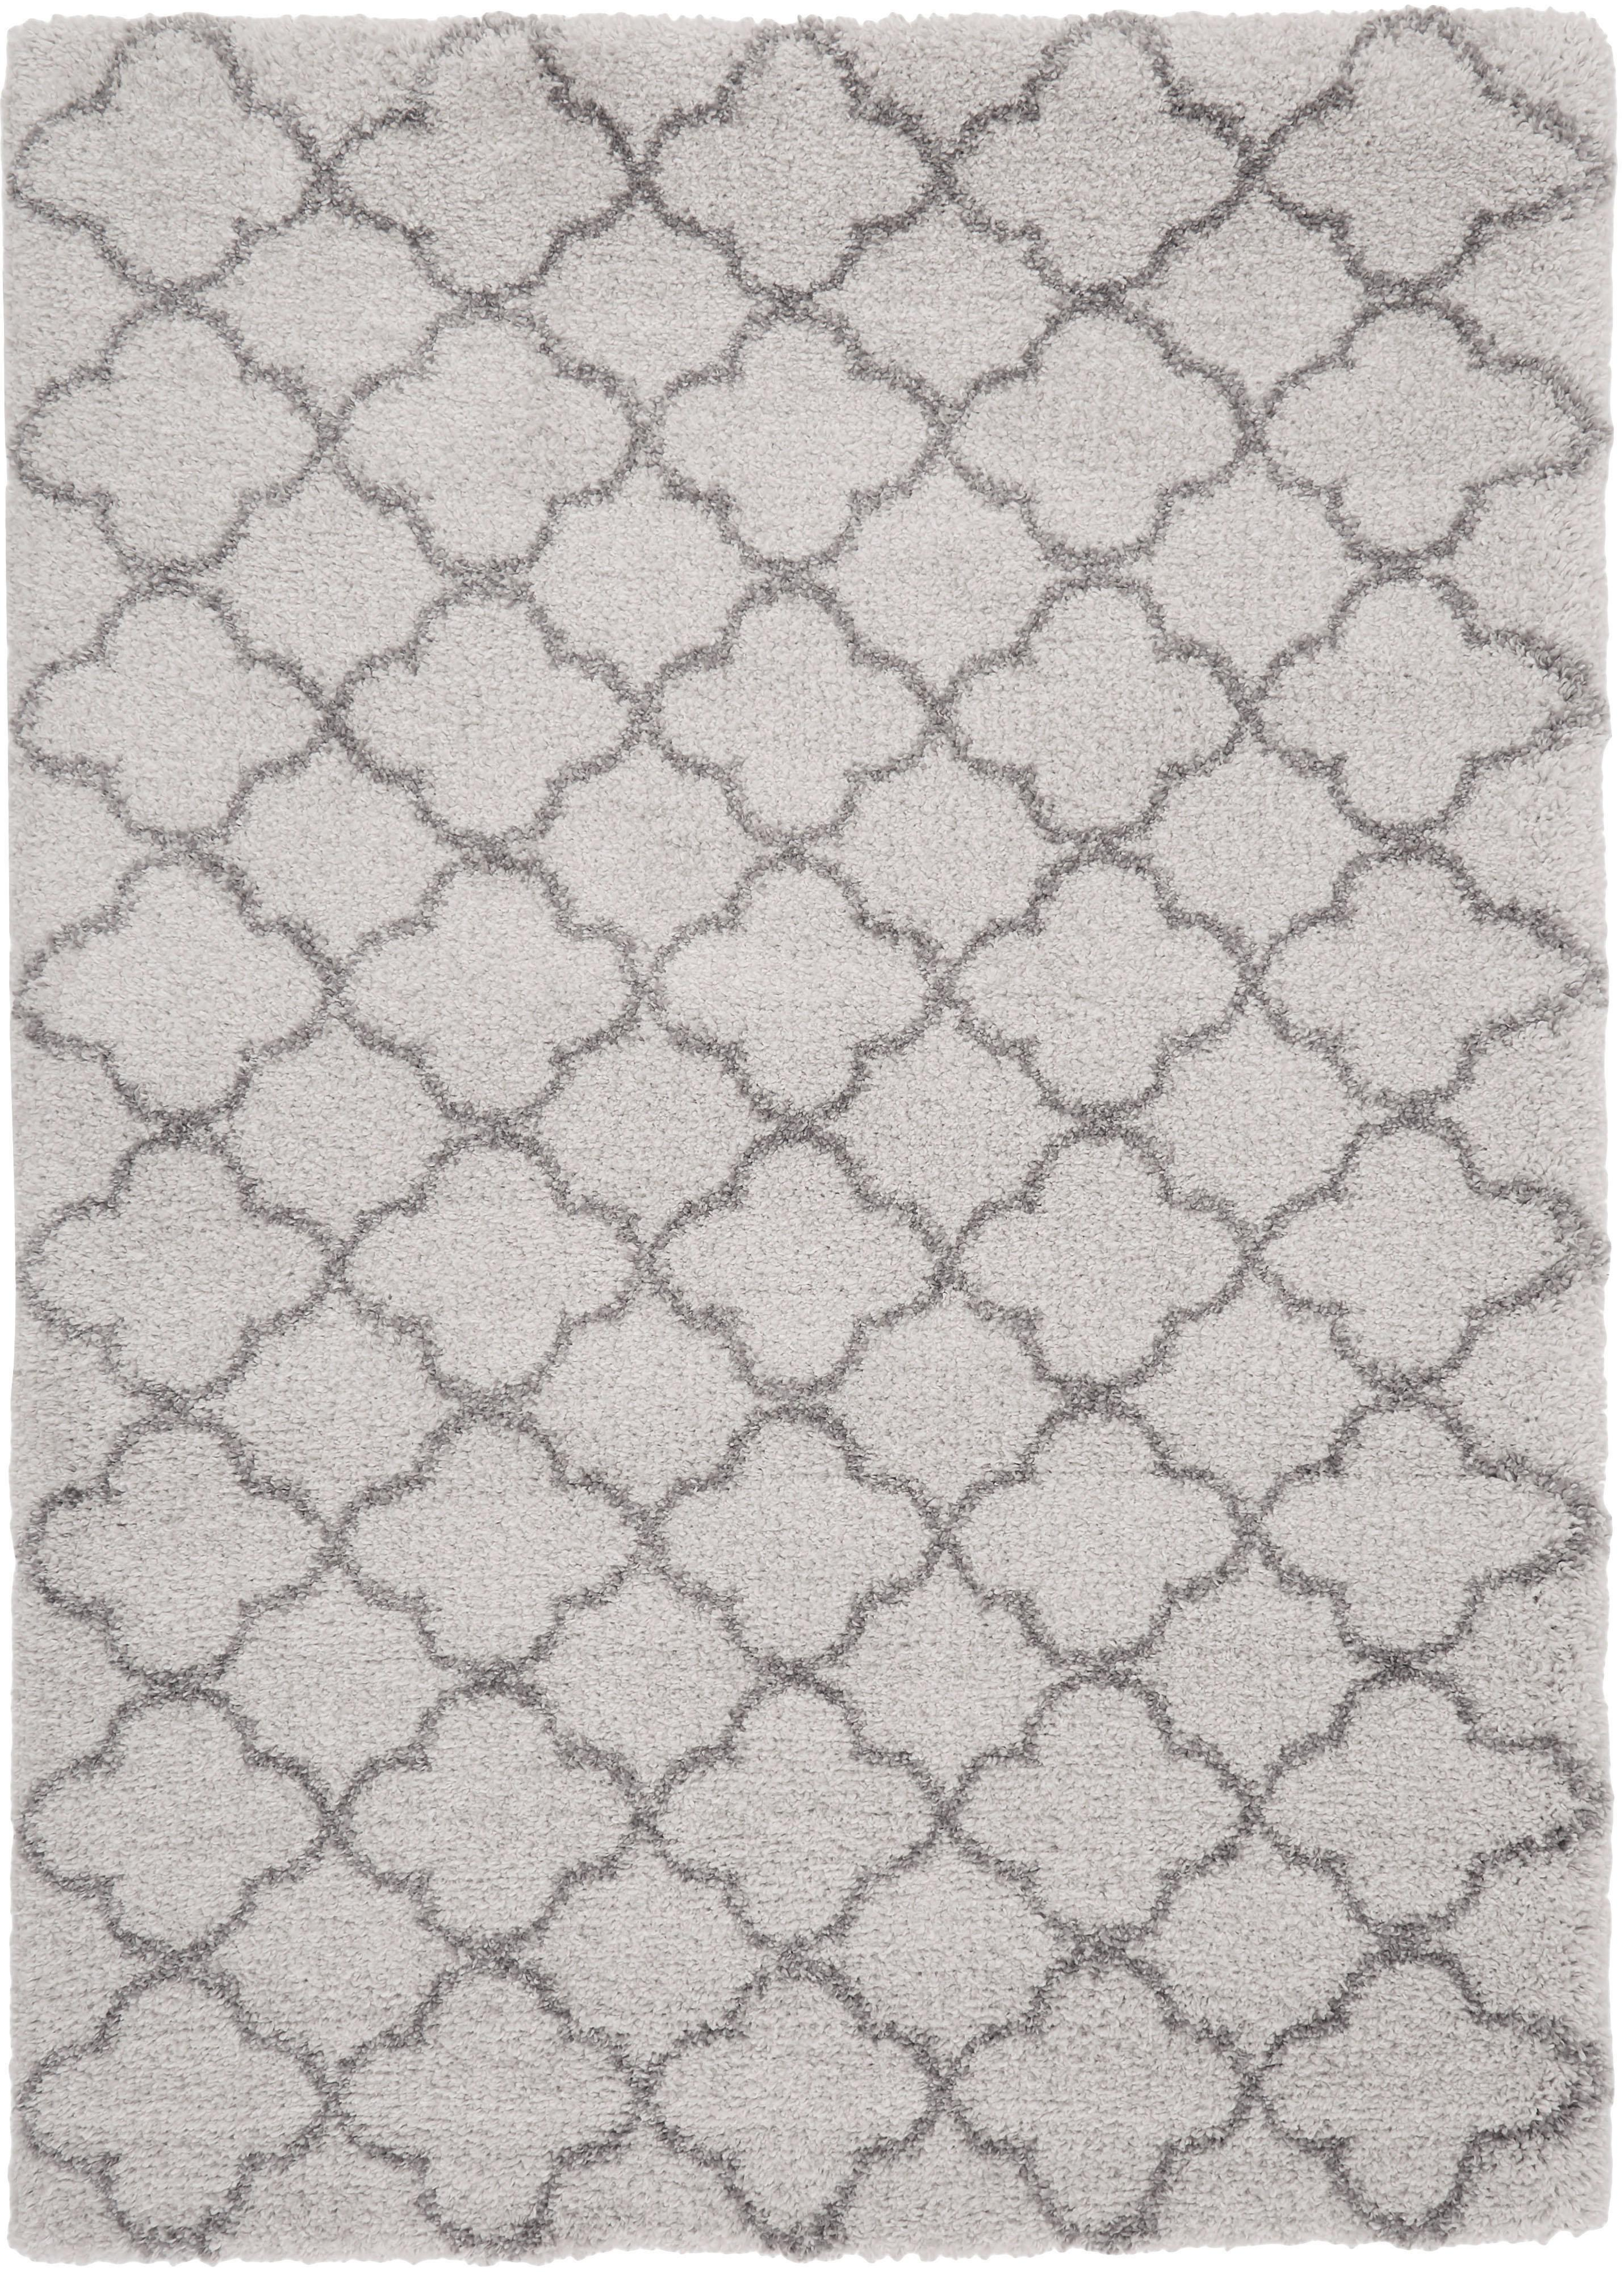 Hochflor-Teppich Grace in Creme/Grau, Flor: 100% Polypropylen, Creme, Grau, B 120 x L 170 cm (Größe S)